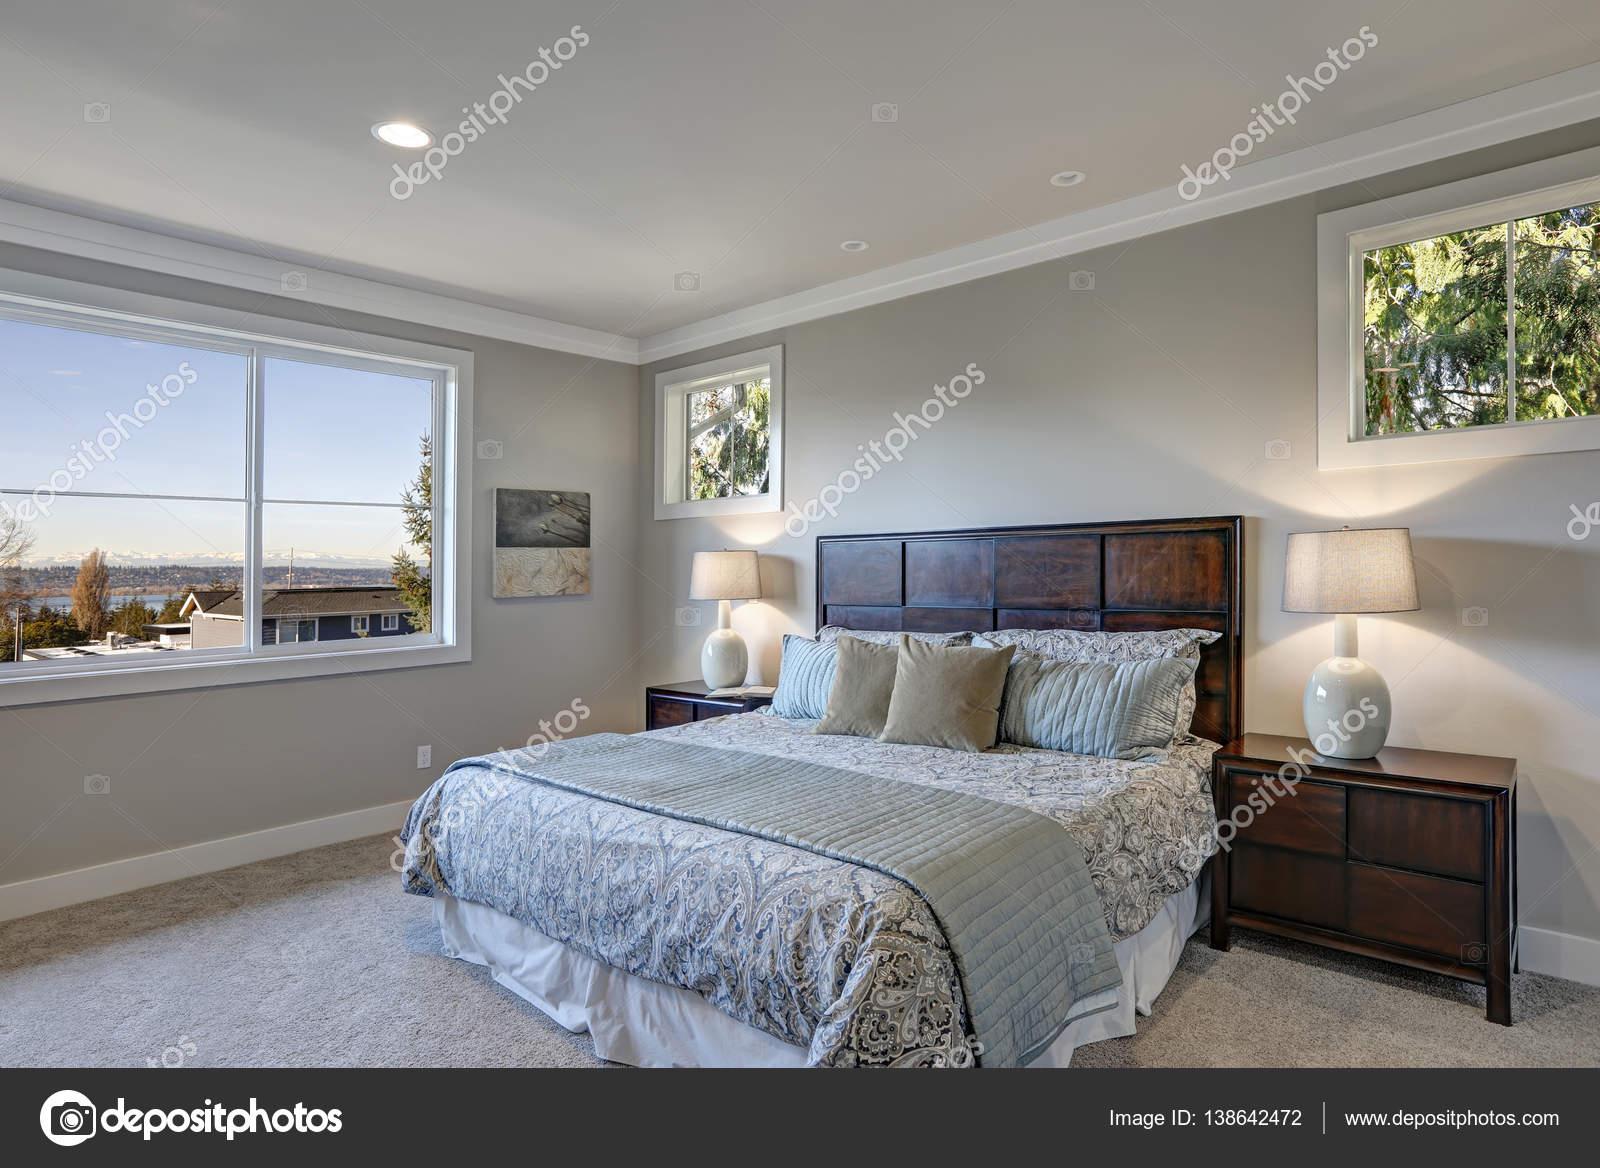 Letto queen size hotel bed foto immagine stock alamy